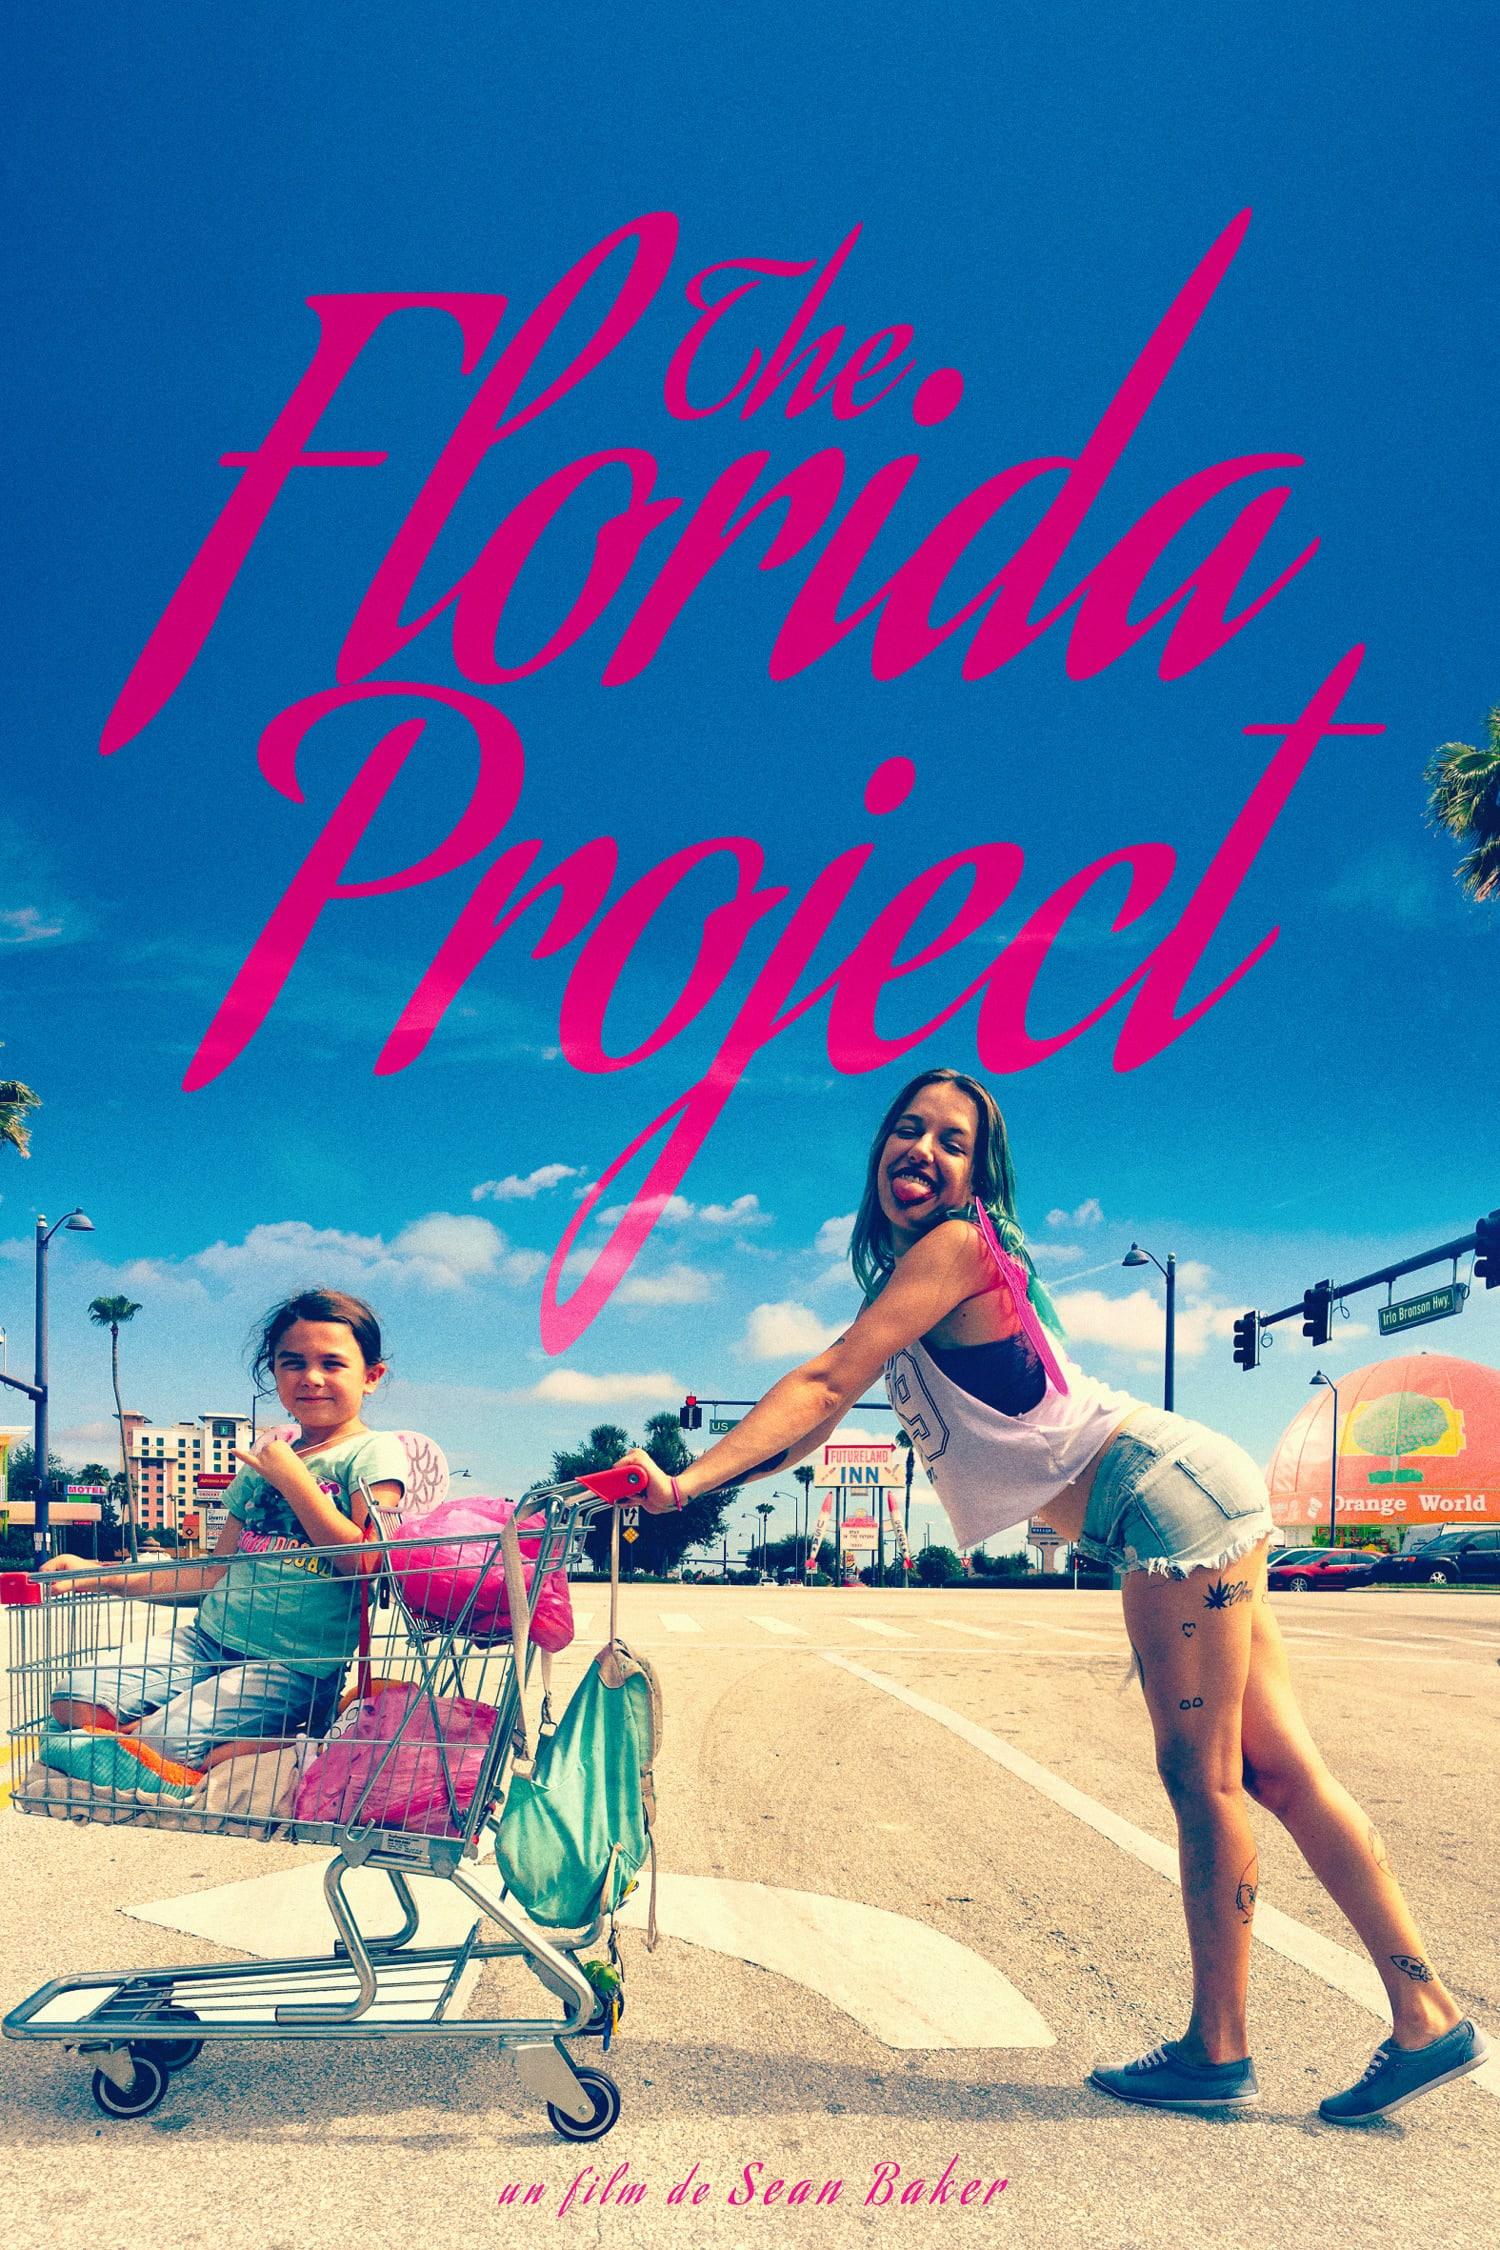 Regarder The Florida Project en streaming gratuit